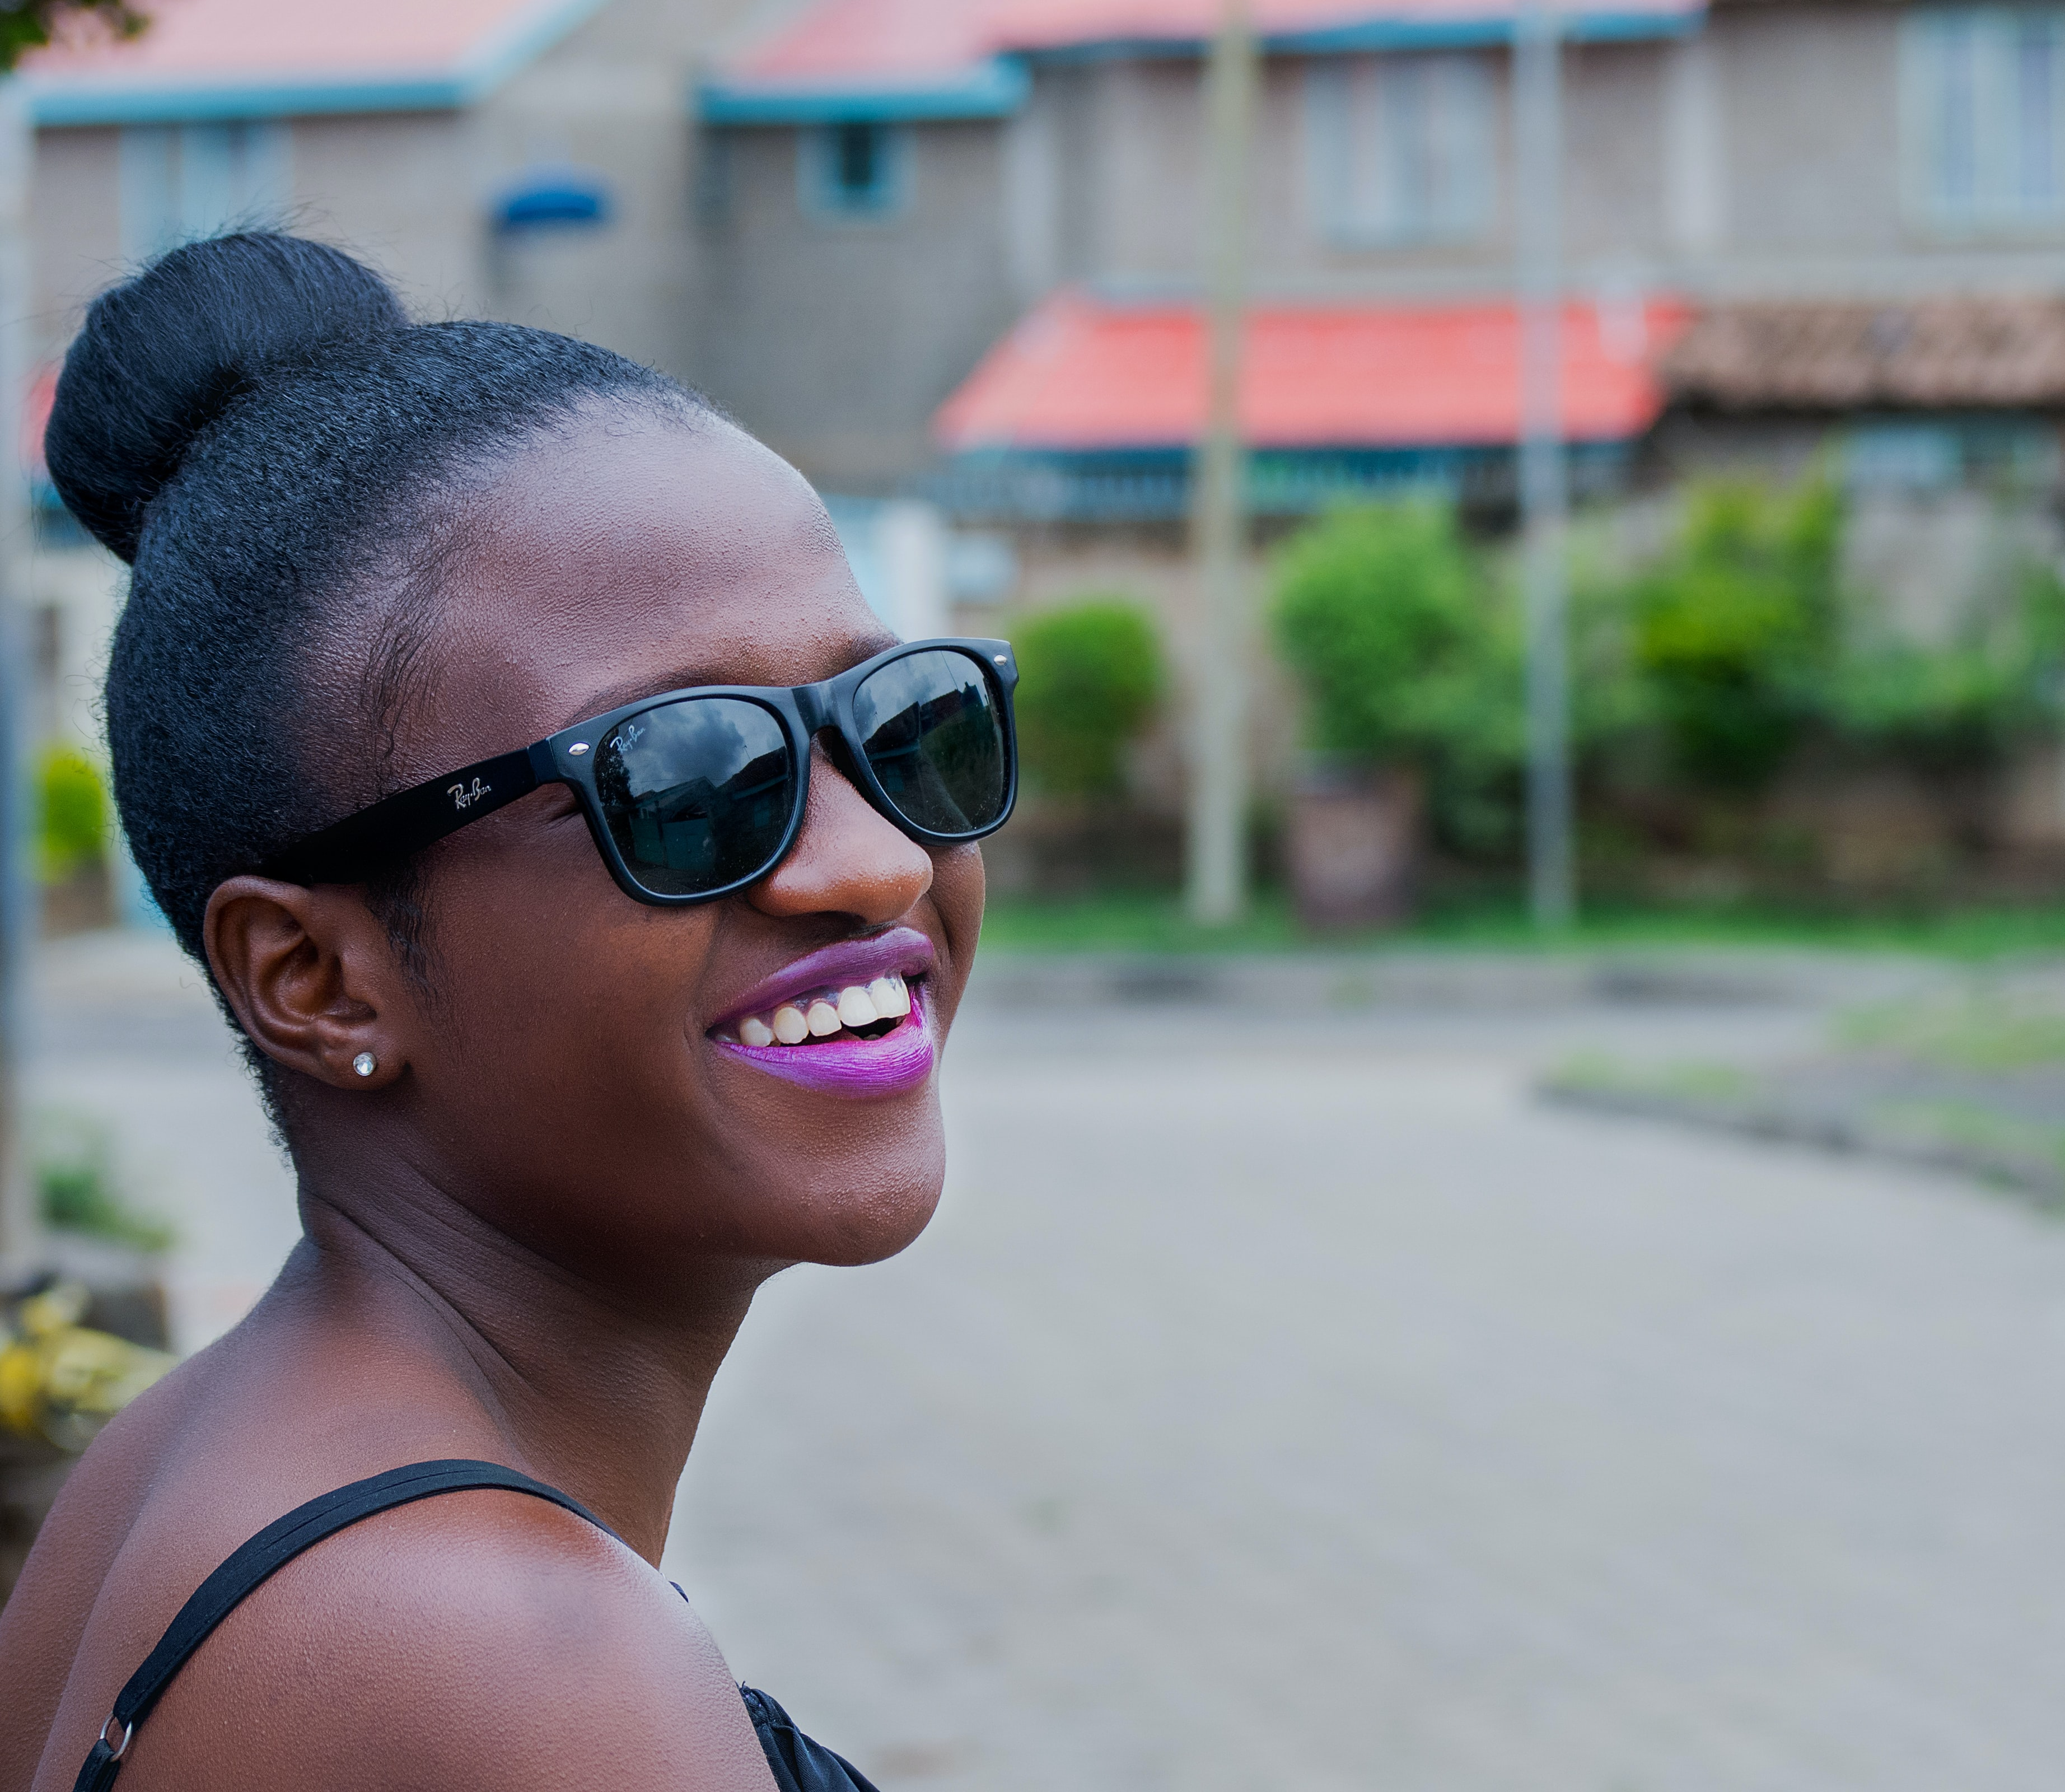 woman wearing black Ray-Ban Wayfarer-style sunglasses smiling